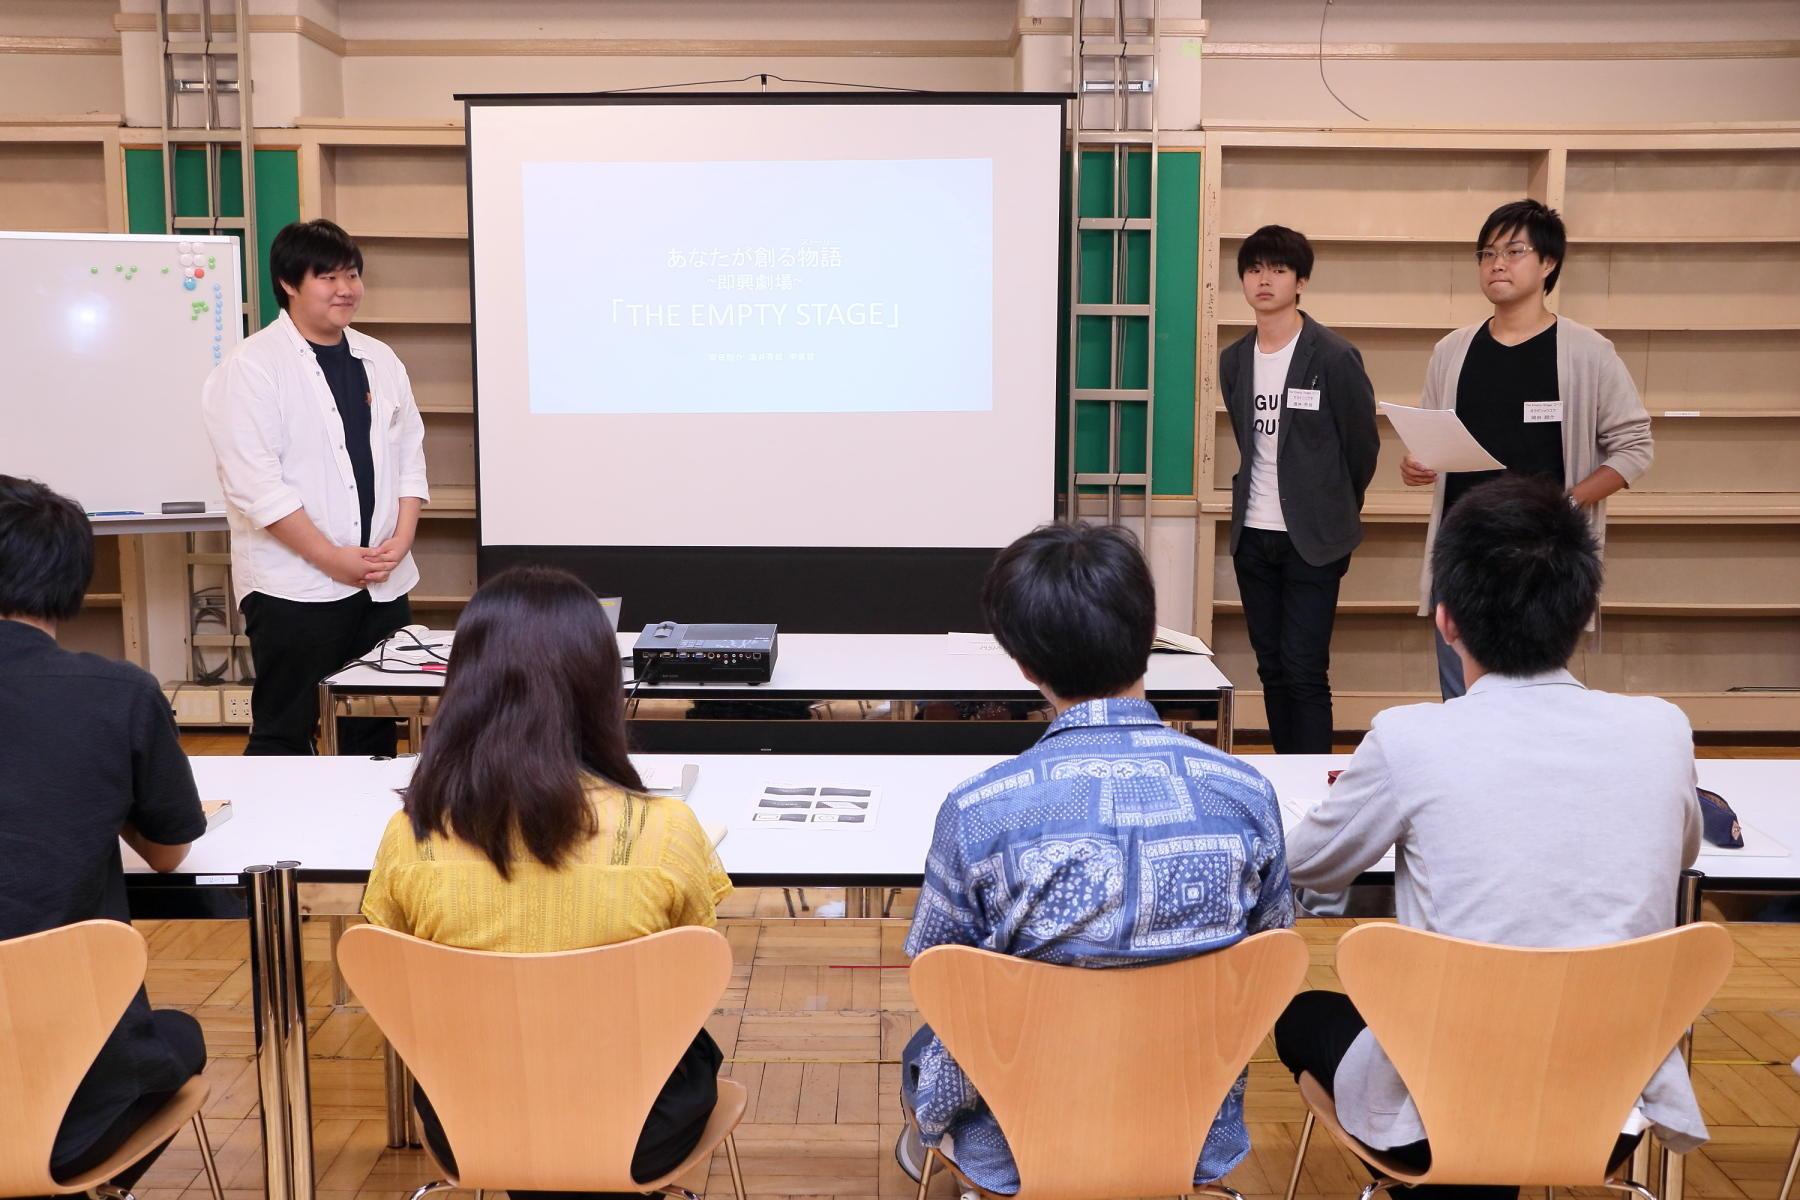 http://news.yoshimoto.co.jp/20170910064038-dd97e684cb046085138e71579ae64d7294894fe5.jpg